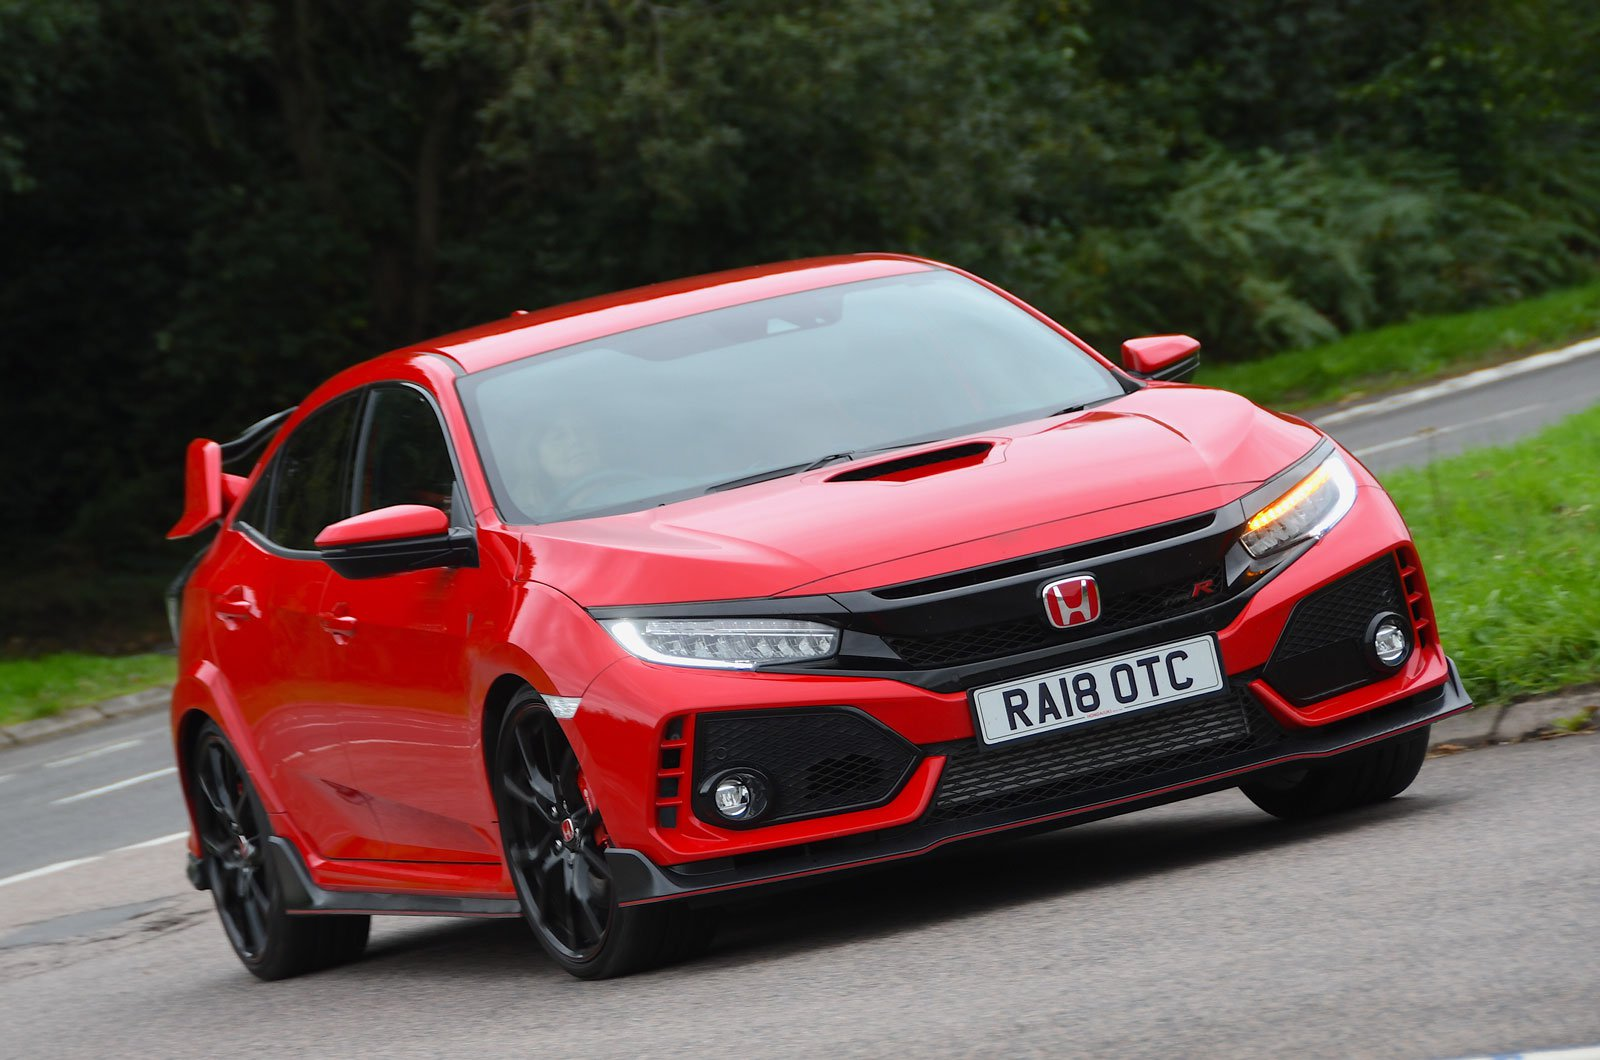 Honda Civic Type R long-term test report